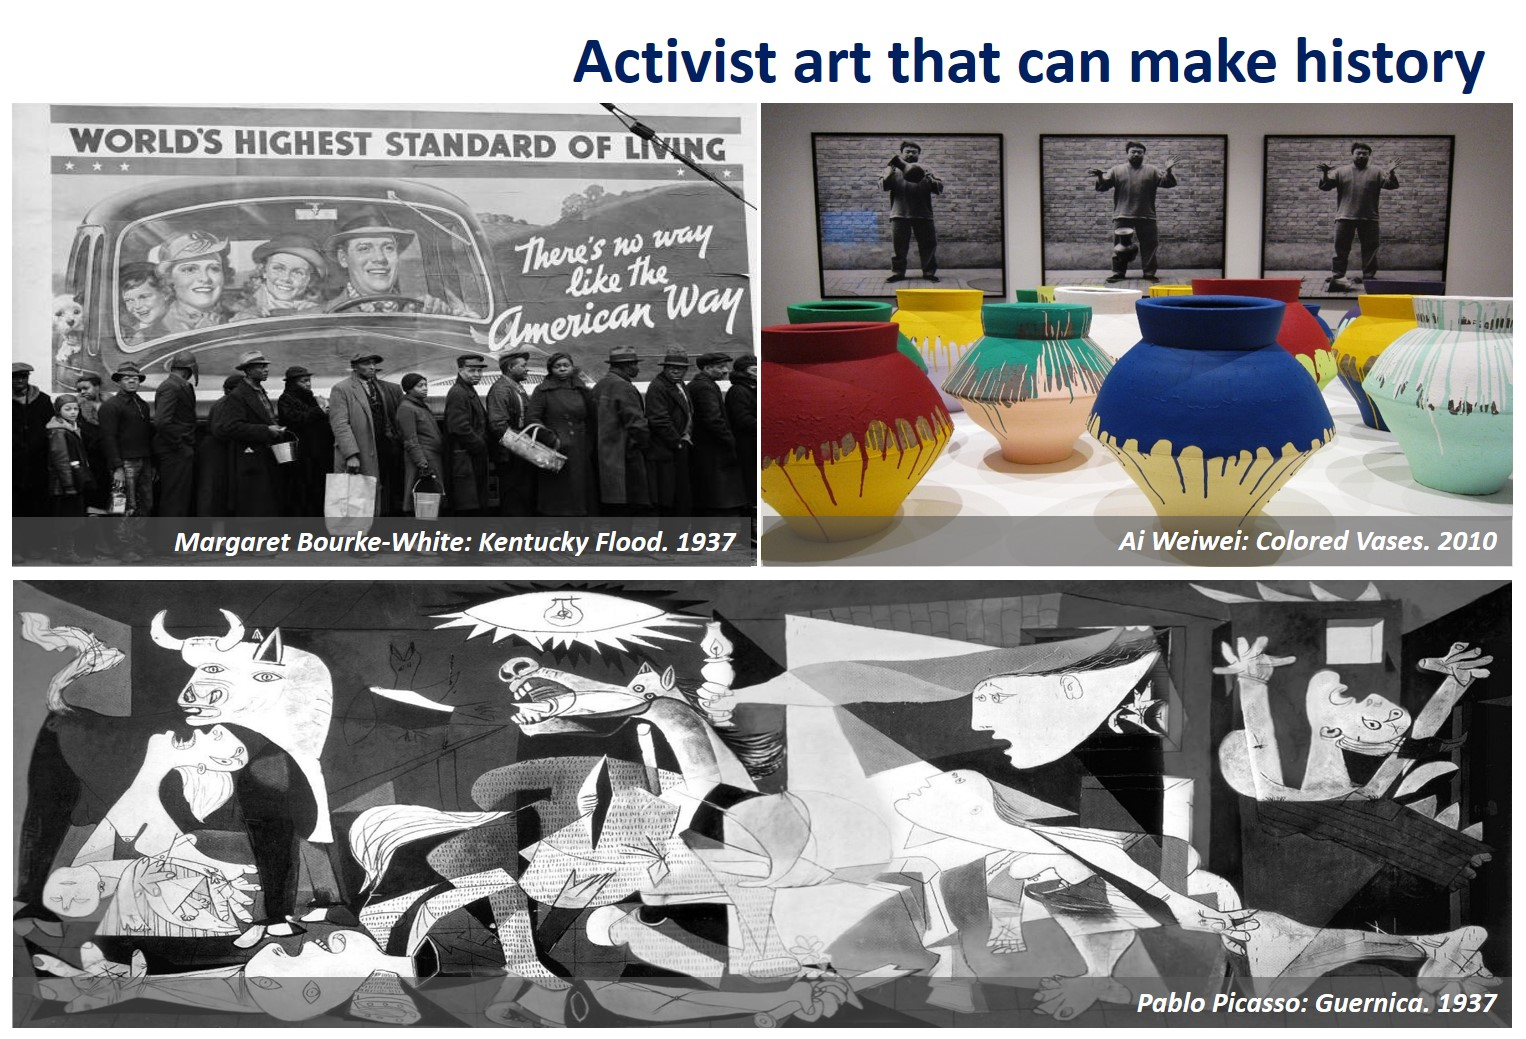 history making art.jpg